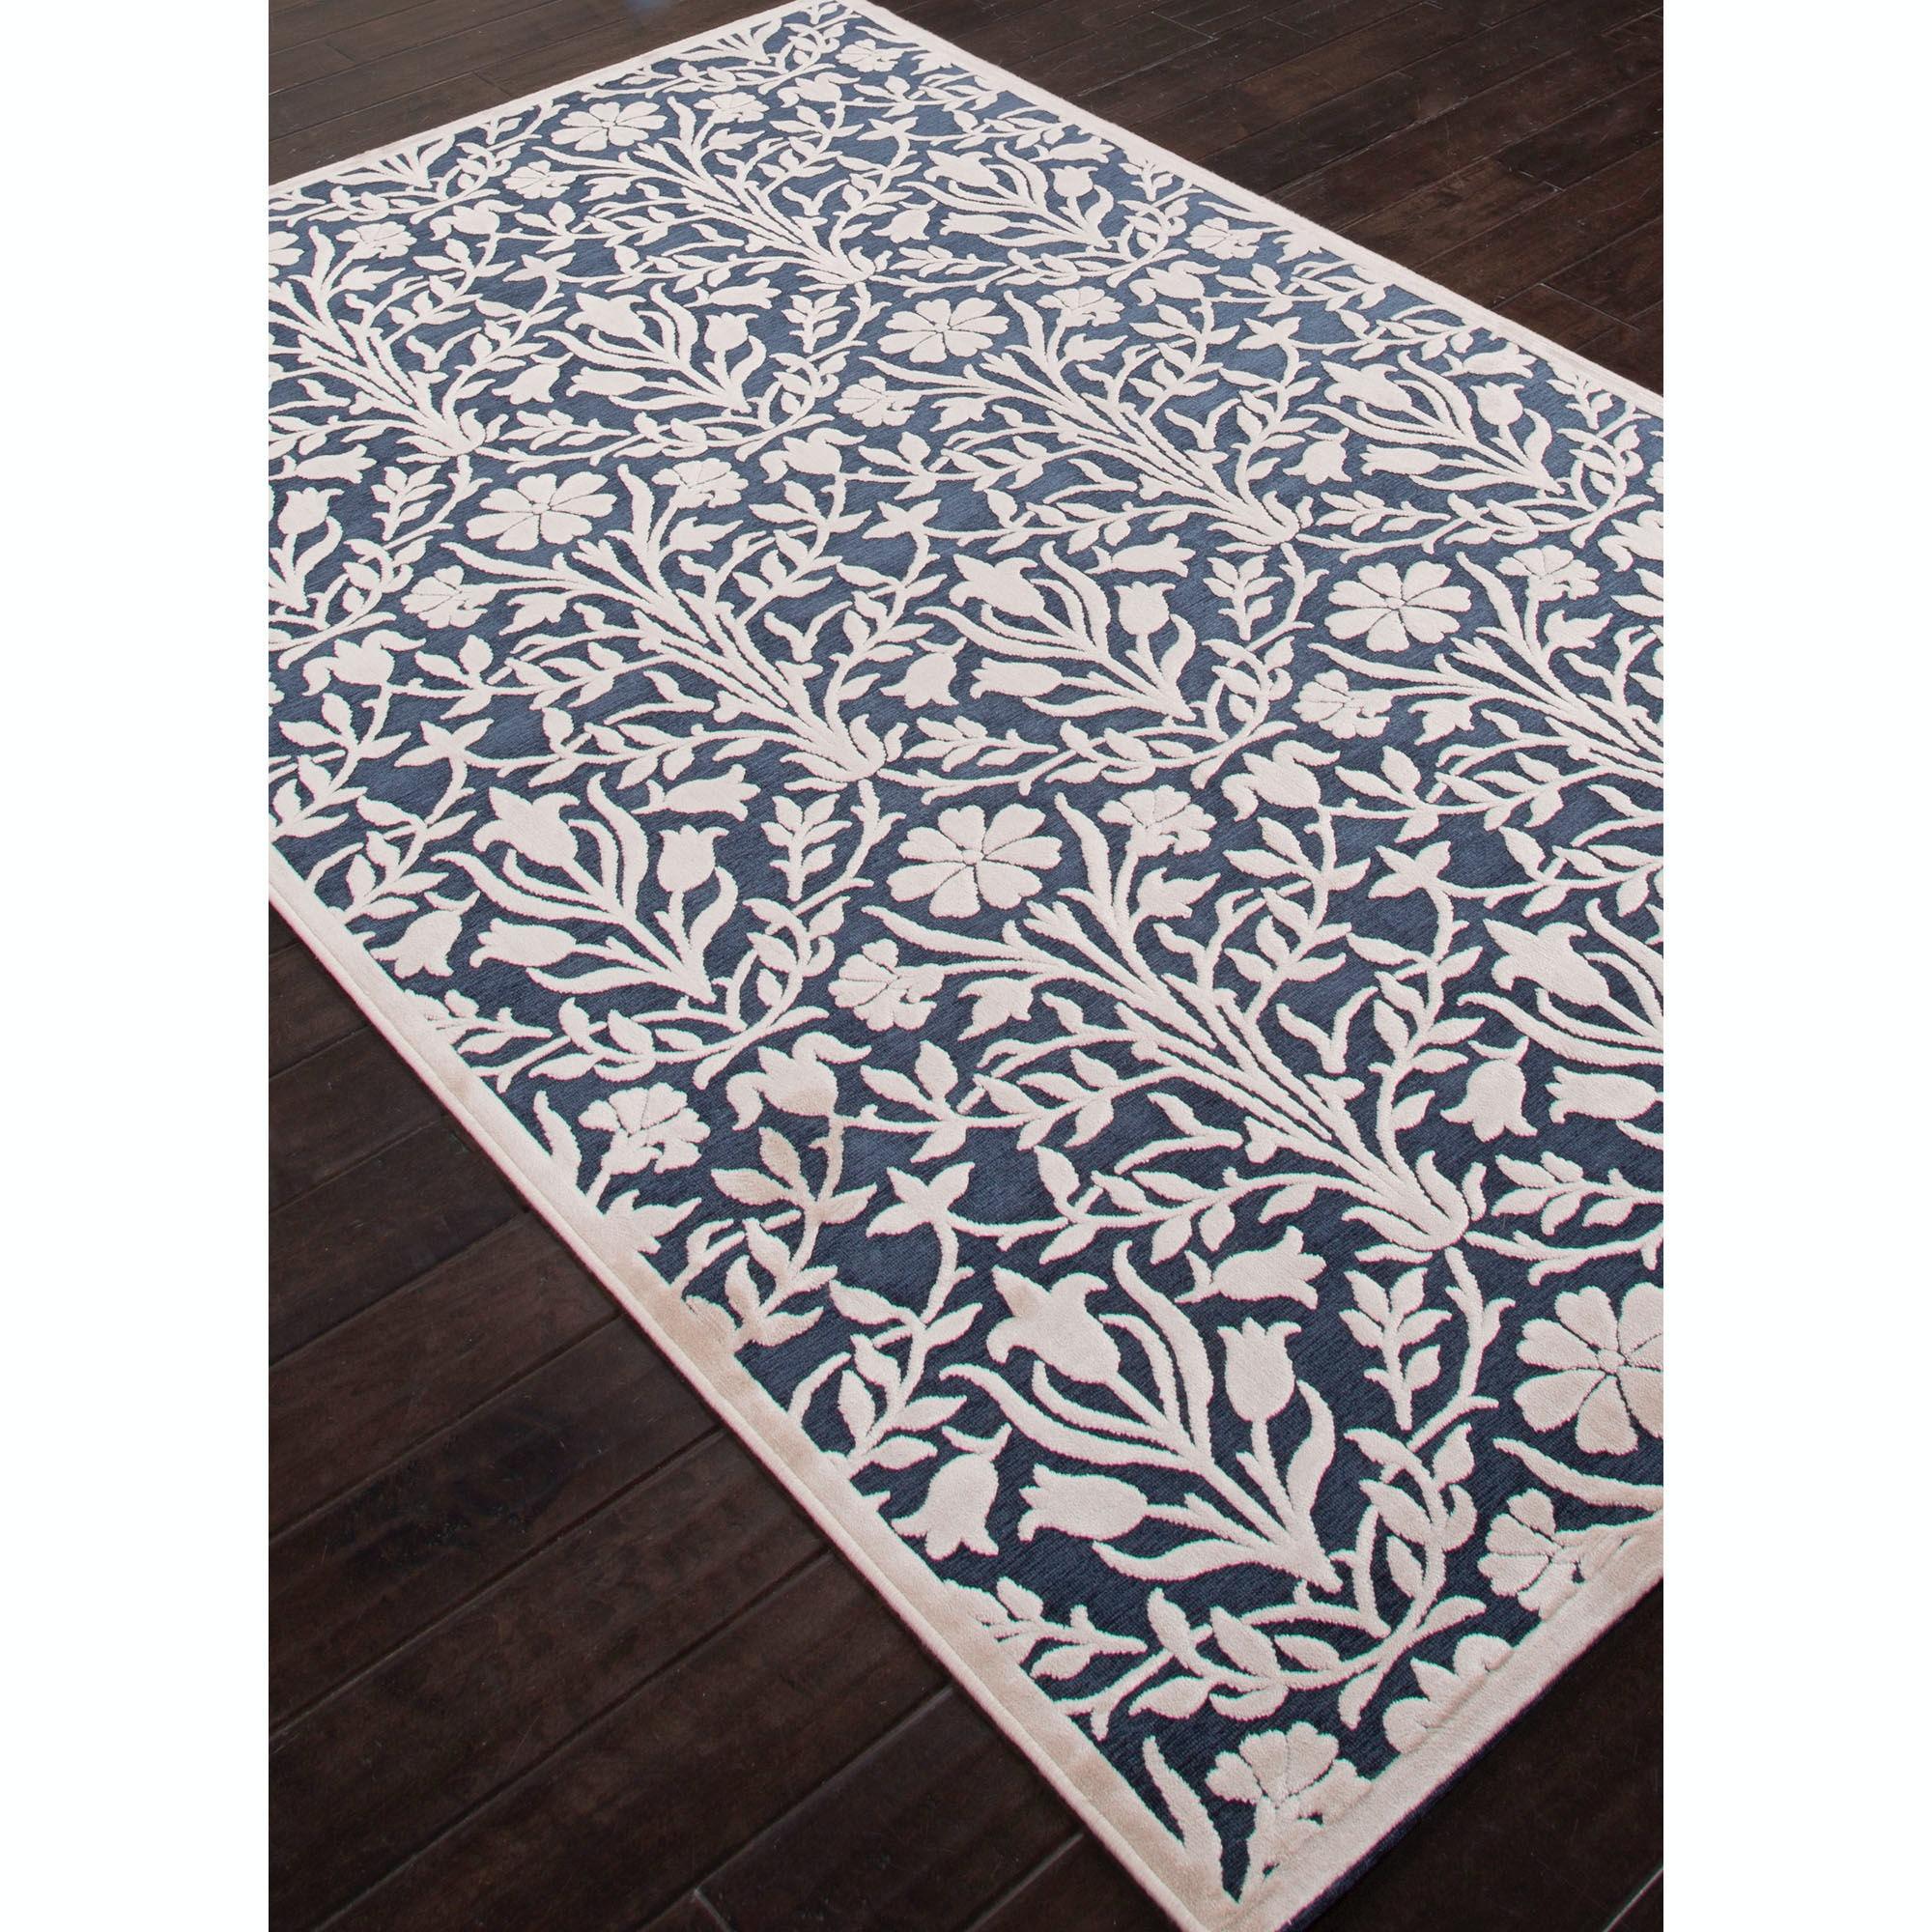 jaipur rugs jaipur machine made floral pattern blueivory u0026 white